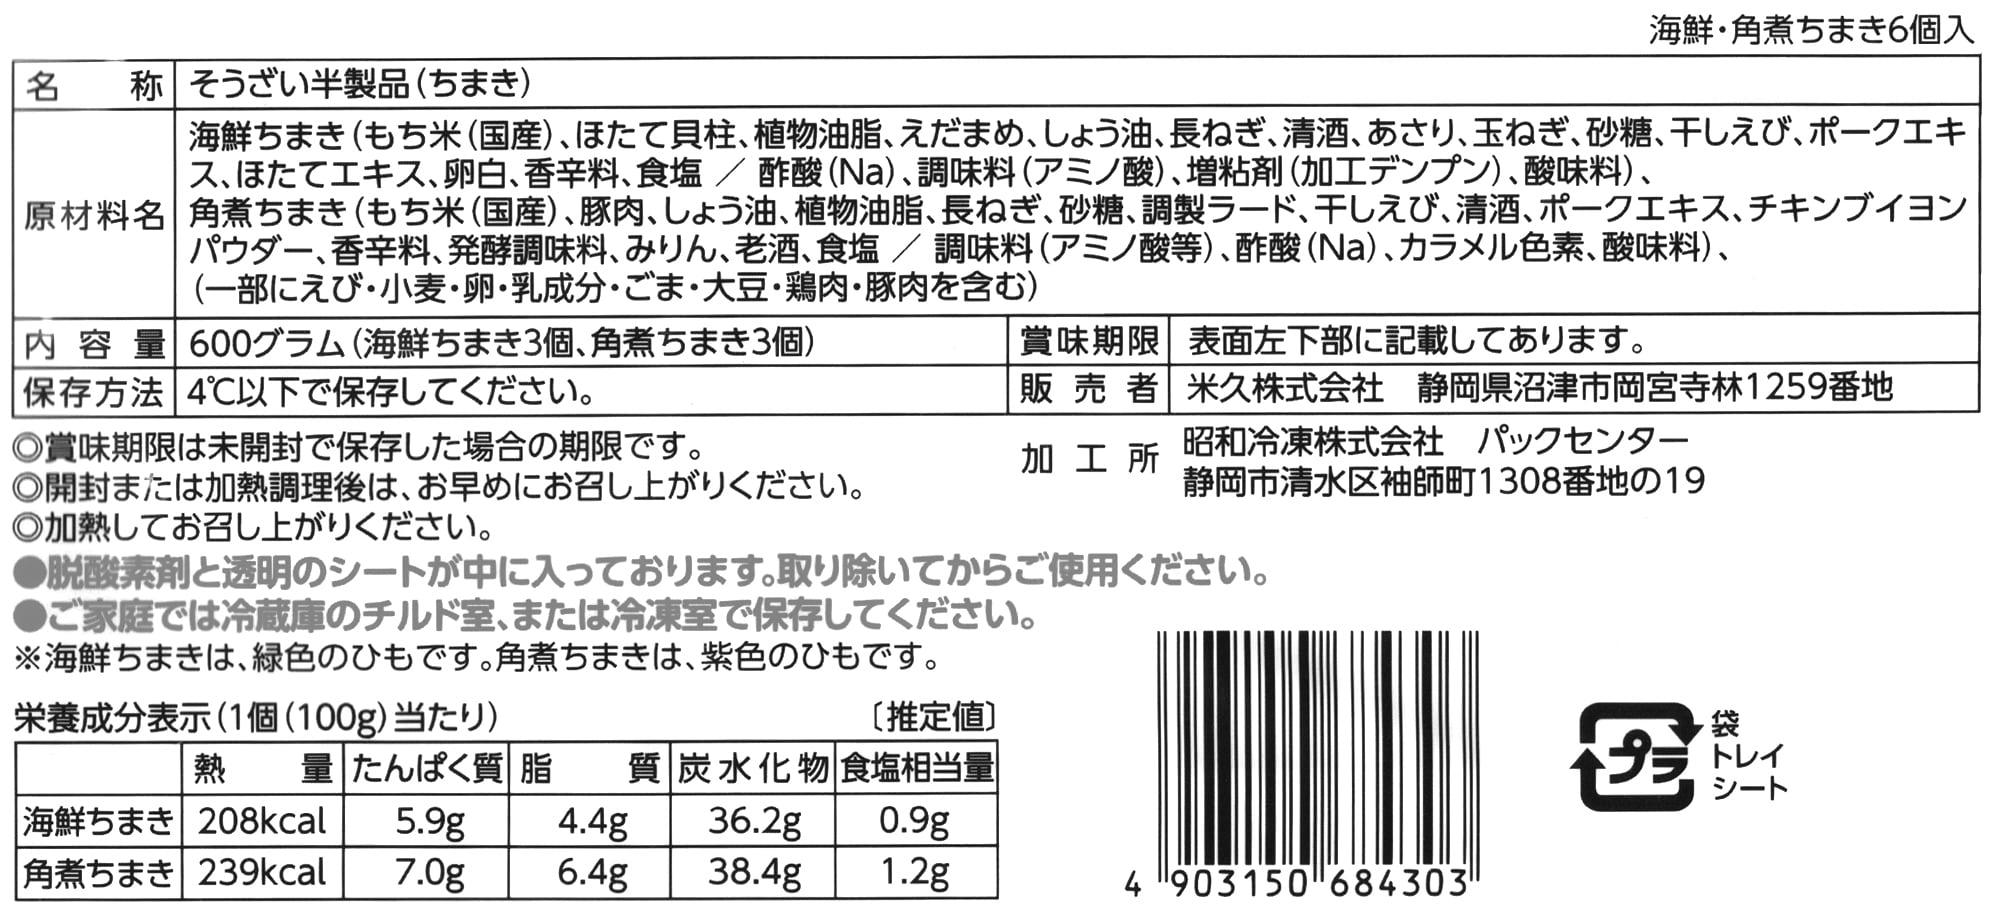 YONEKYU もちもちとした大きなちまき 海鮮&角煮 600g 裏面ラベル(原材料・カロリーほか)